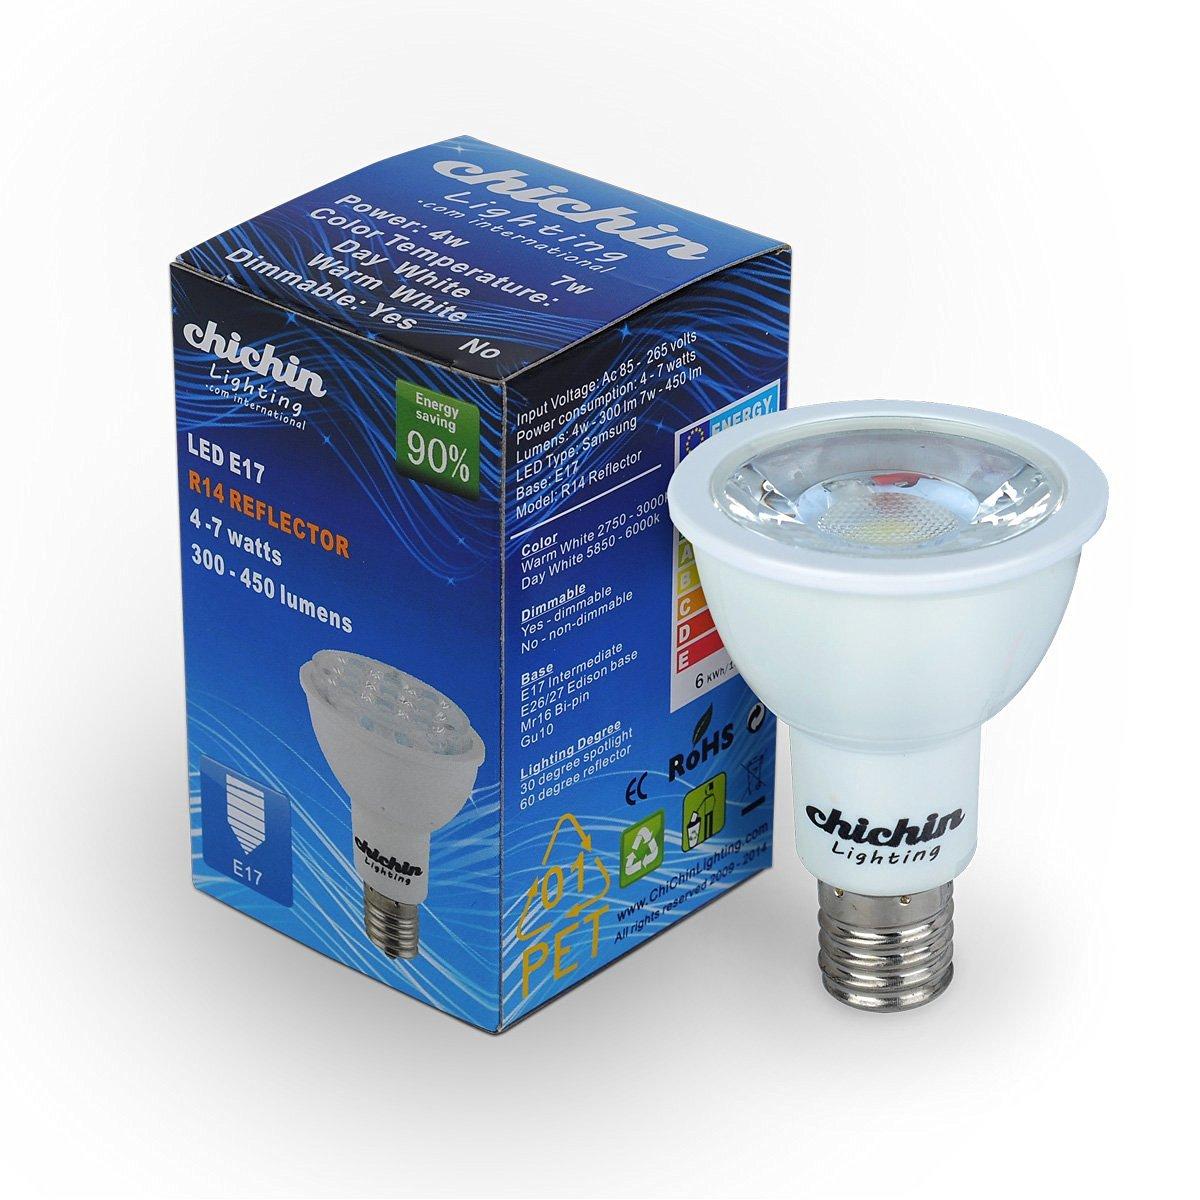 ChichinLighting 1-pack par16 COB e17 R14 LED spotlight light 7W 2850K warm white 500lm brightest led bulbs AC 110V 60W halogen bulbs replacement